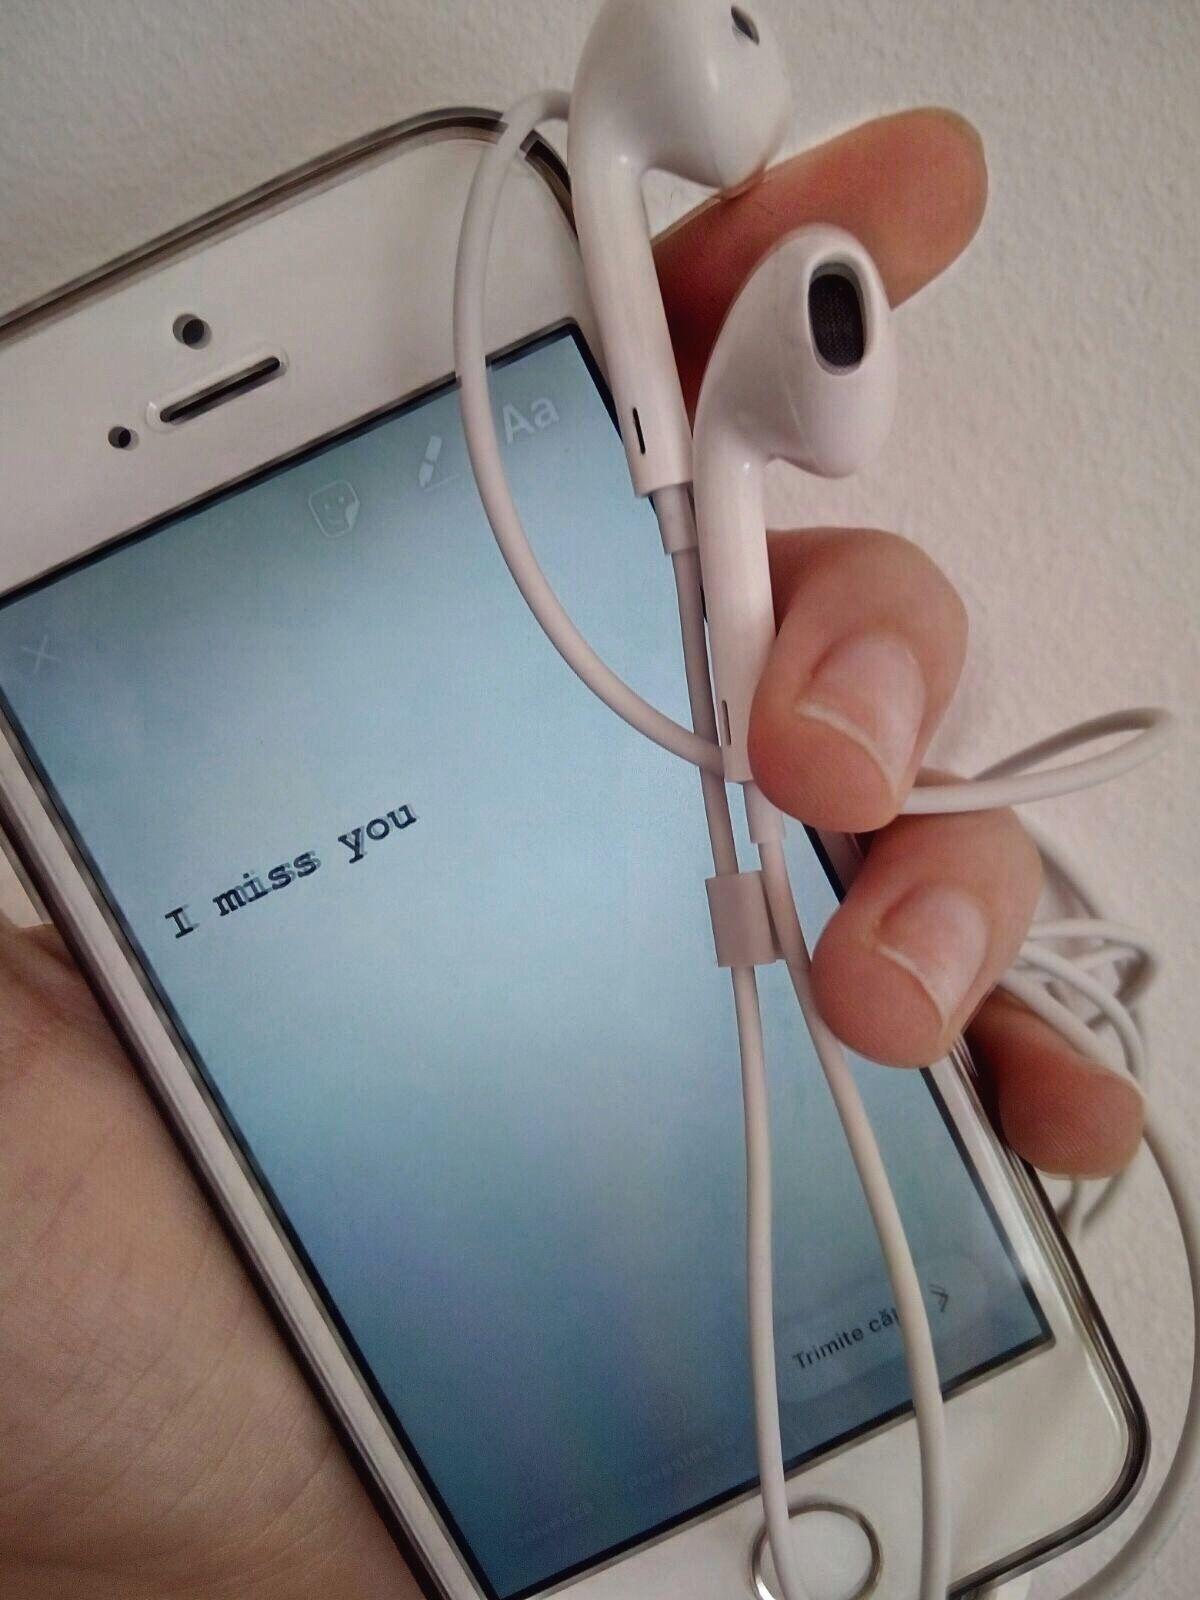 Tumblr Aesthetic Indie Grunge Quotes Phone Headphones White Imissyou Sayings Weheartit Vsco Wall Iphone Knizhnaya Fotografiya Naushniki Prilozheniya